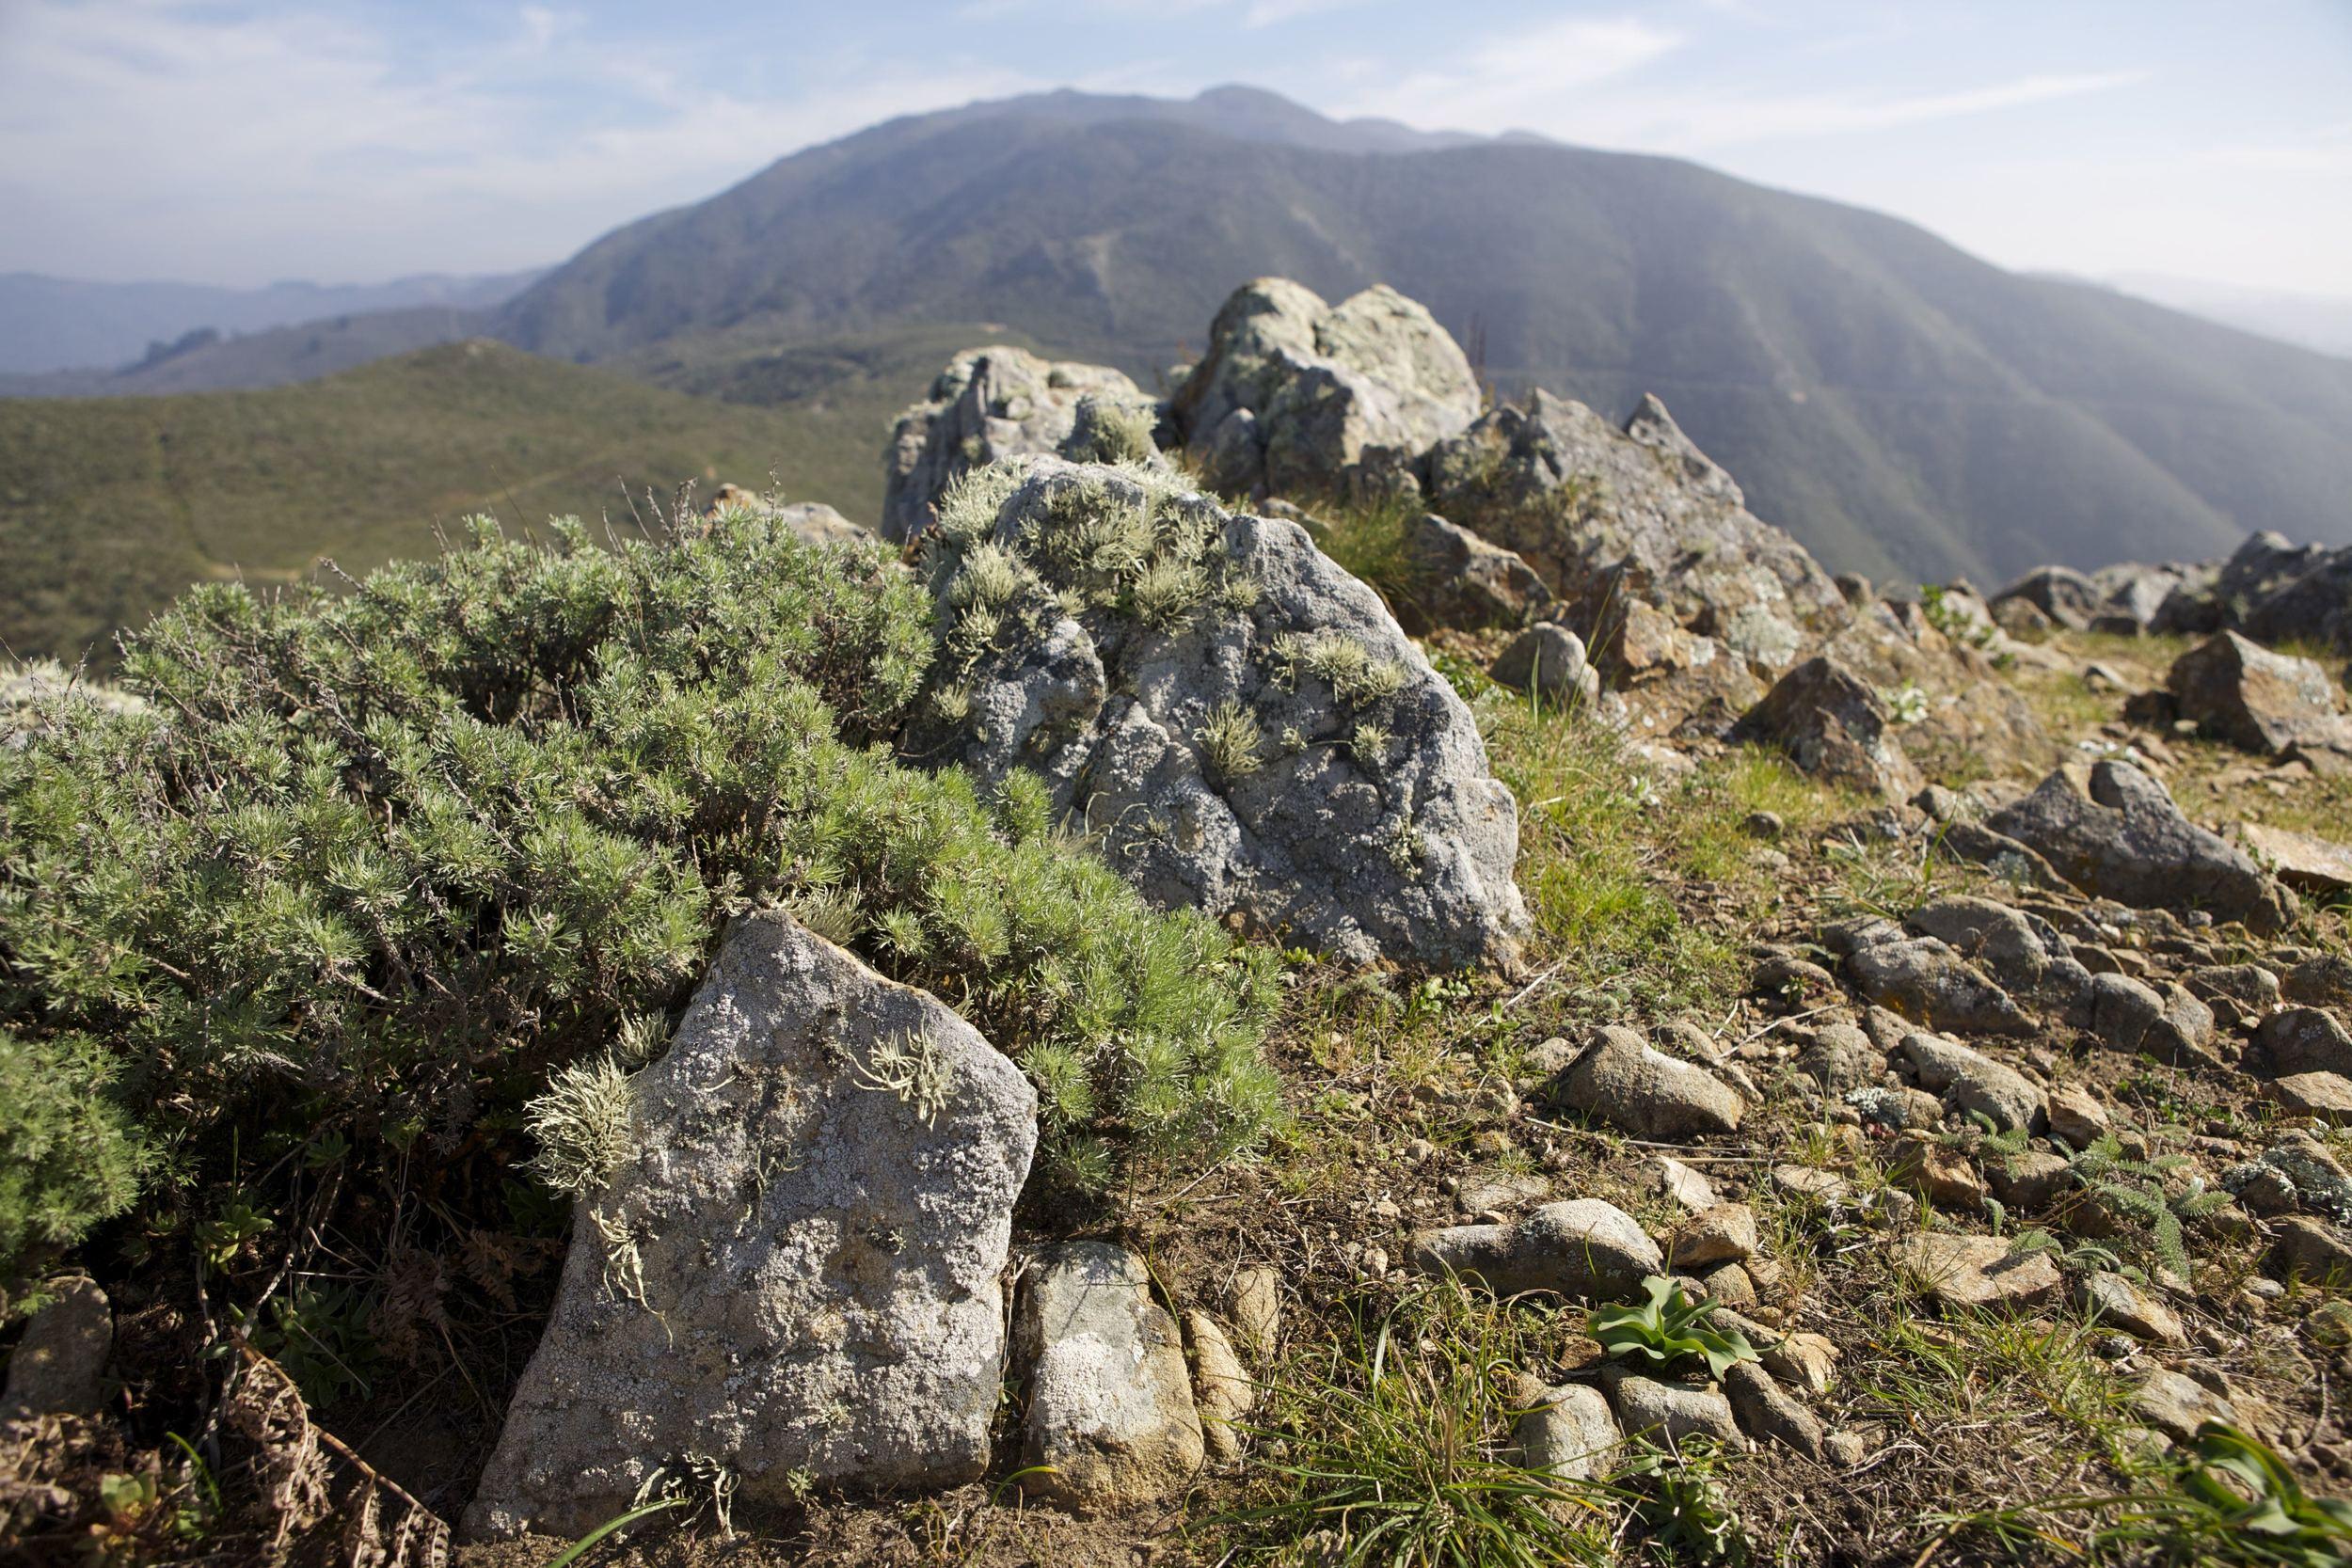 Montara Mt. IMG_0818.jpg